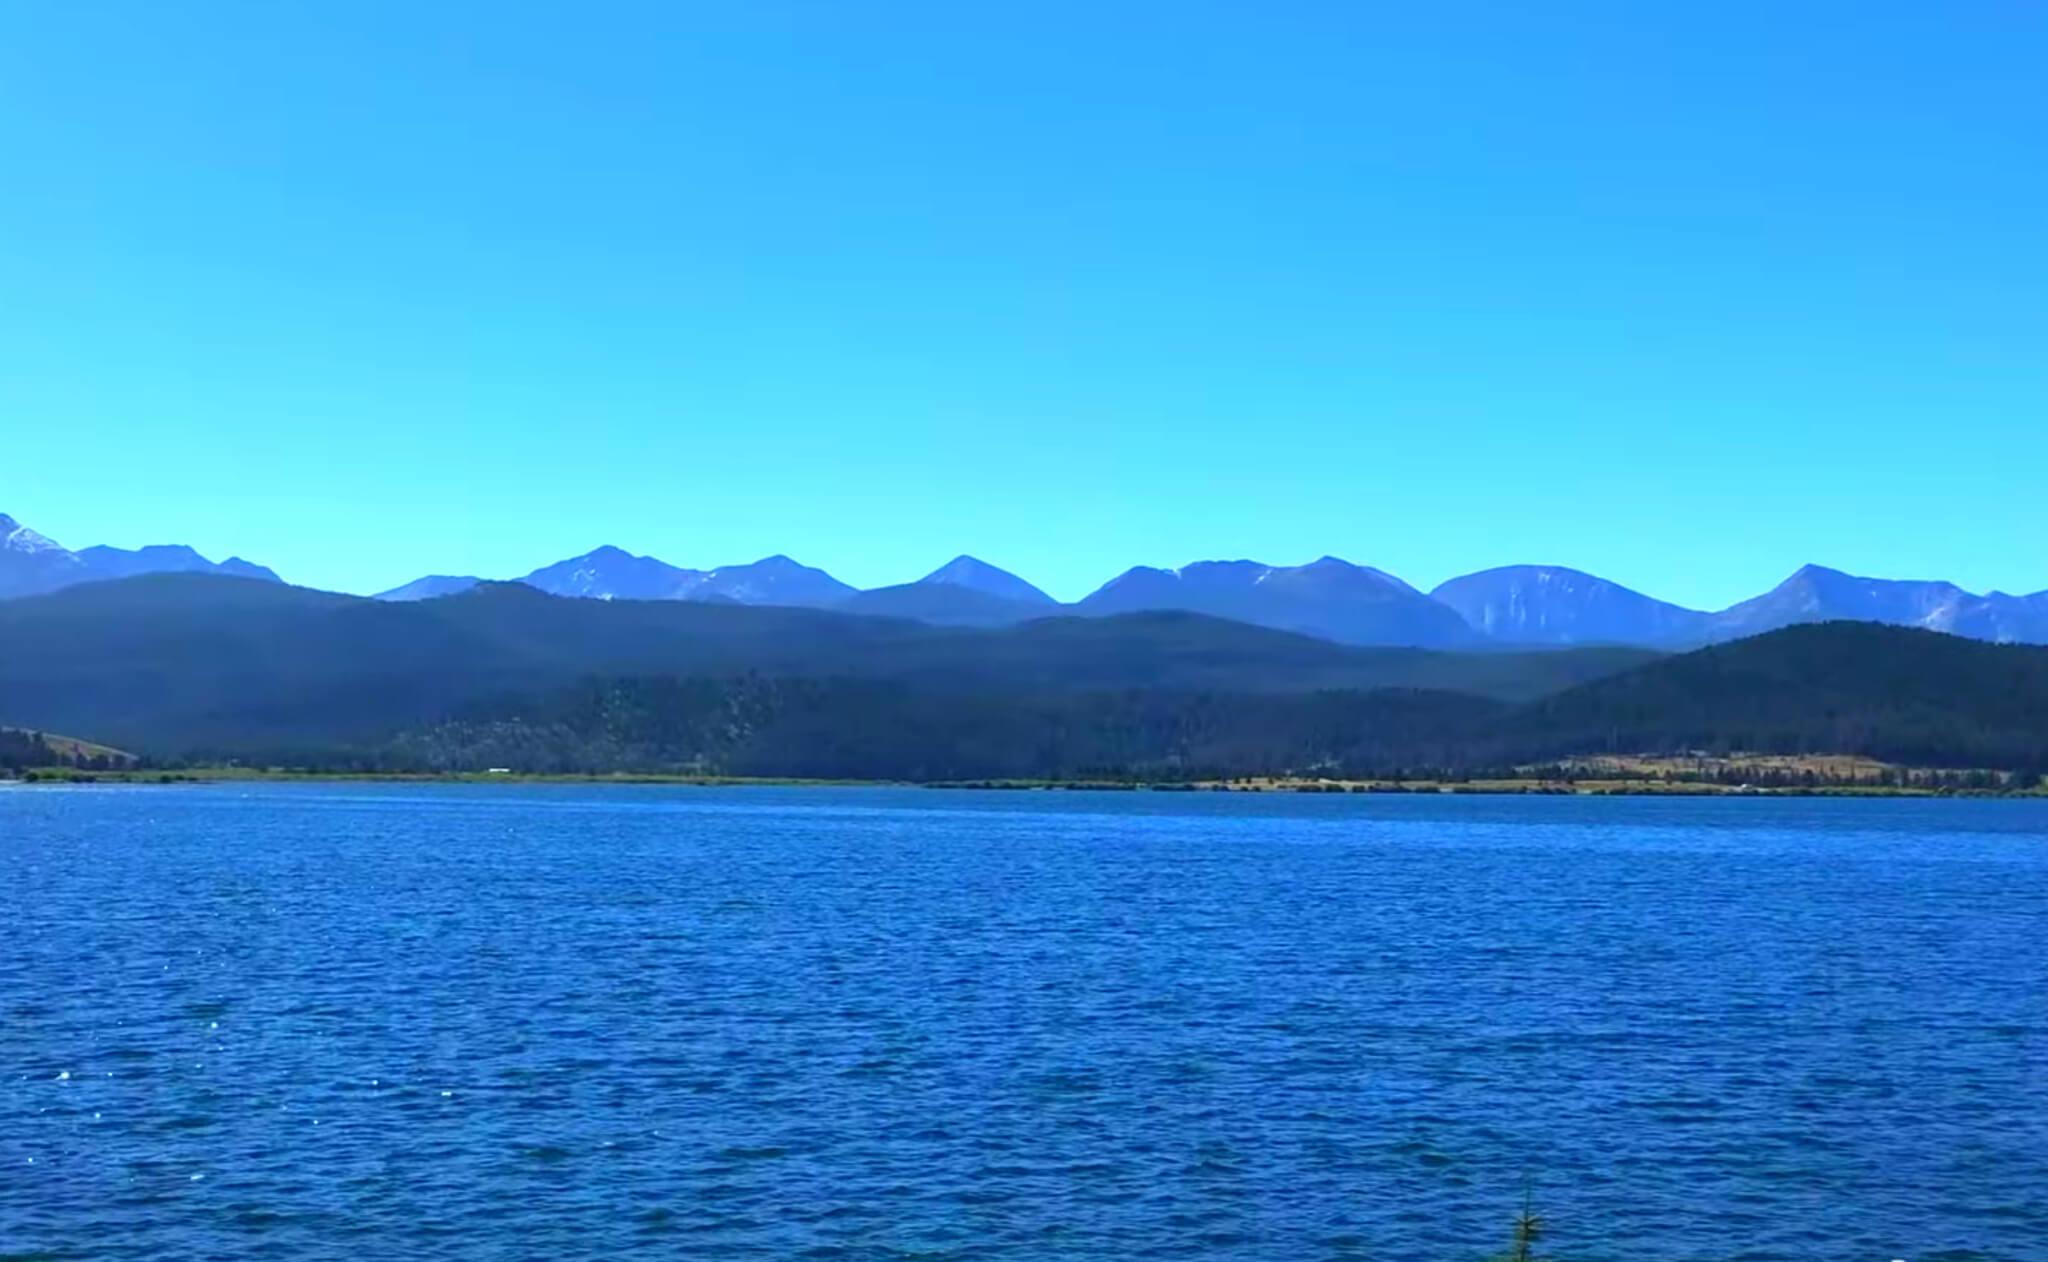 Georgetown-Lake-Fishing-Report-Guide-Montana-MT-04